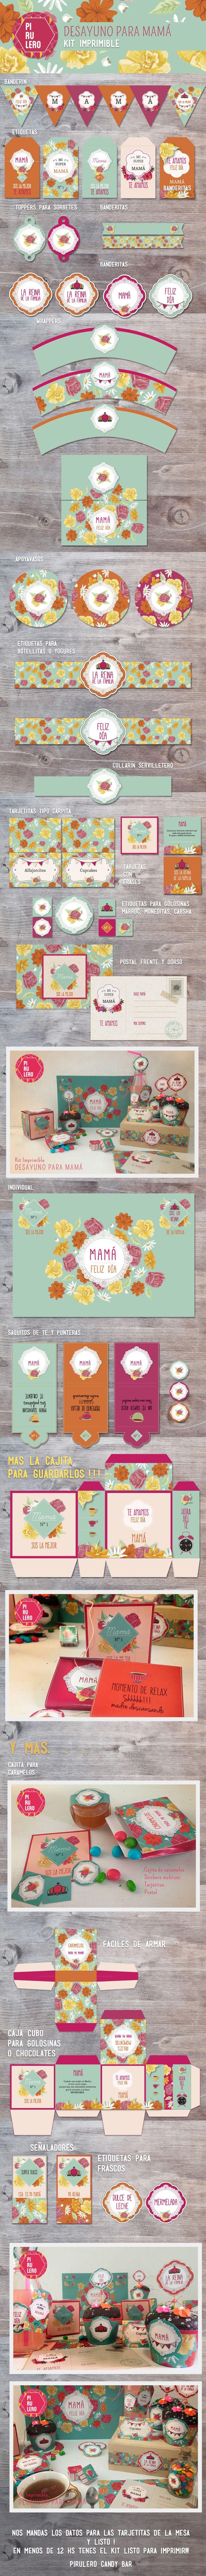 Dia de la madre - desayuno - kit imprimible #diadelamadre #mama #desayuno…